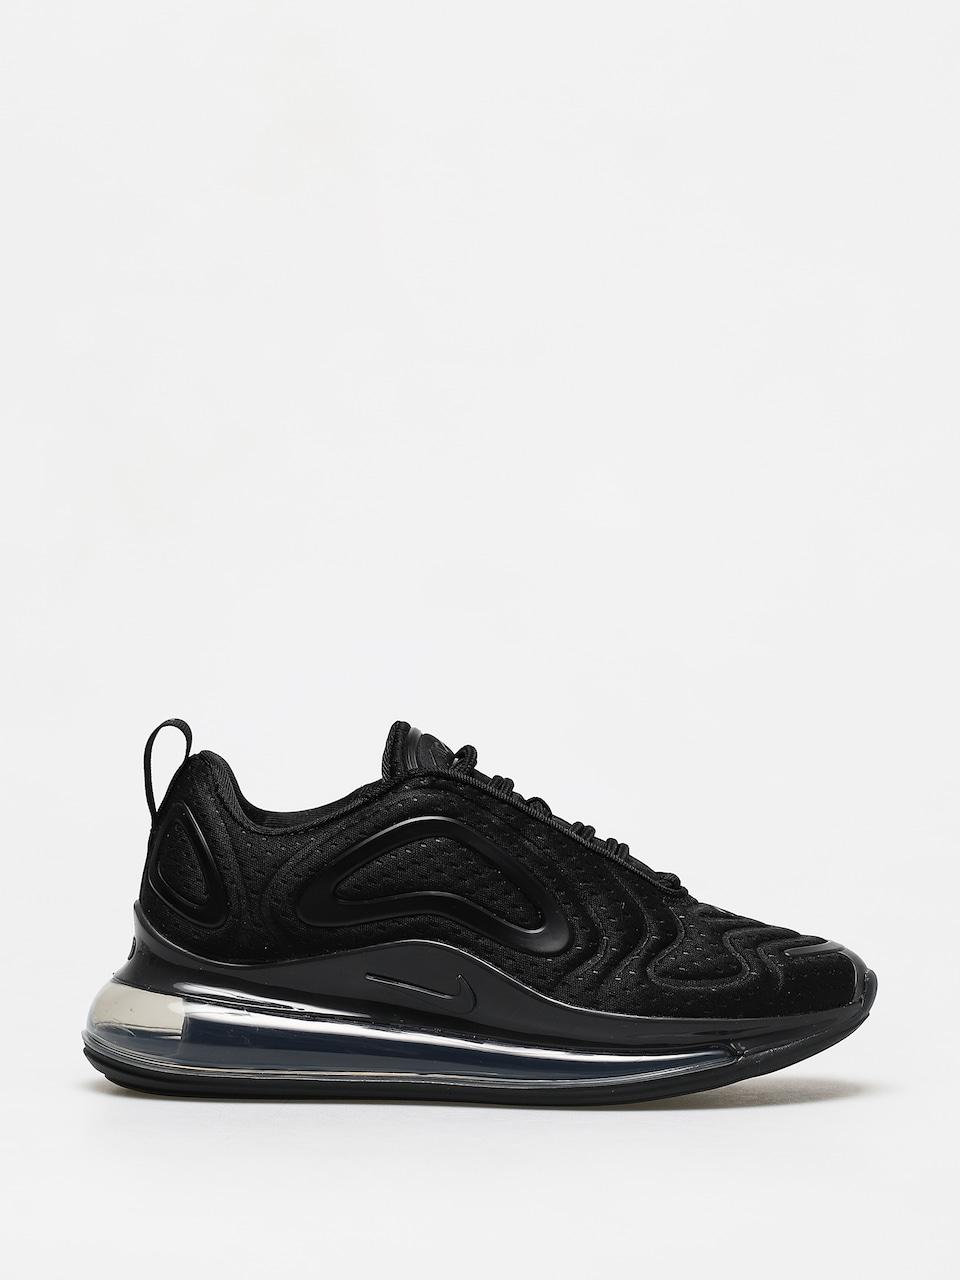 Nike AIR MAX 720 'Black Antracite' | AR9293 003 | Buty